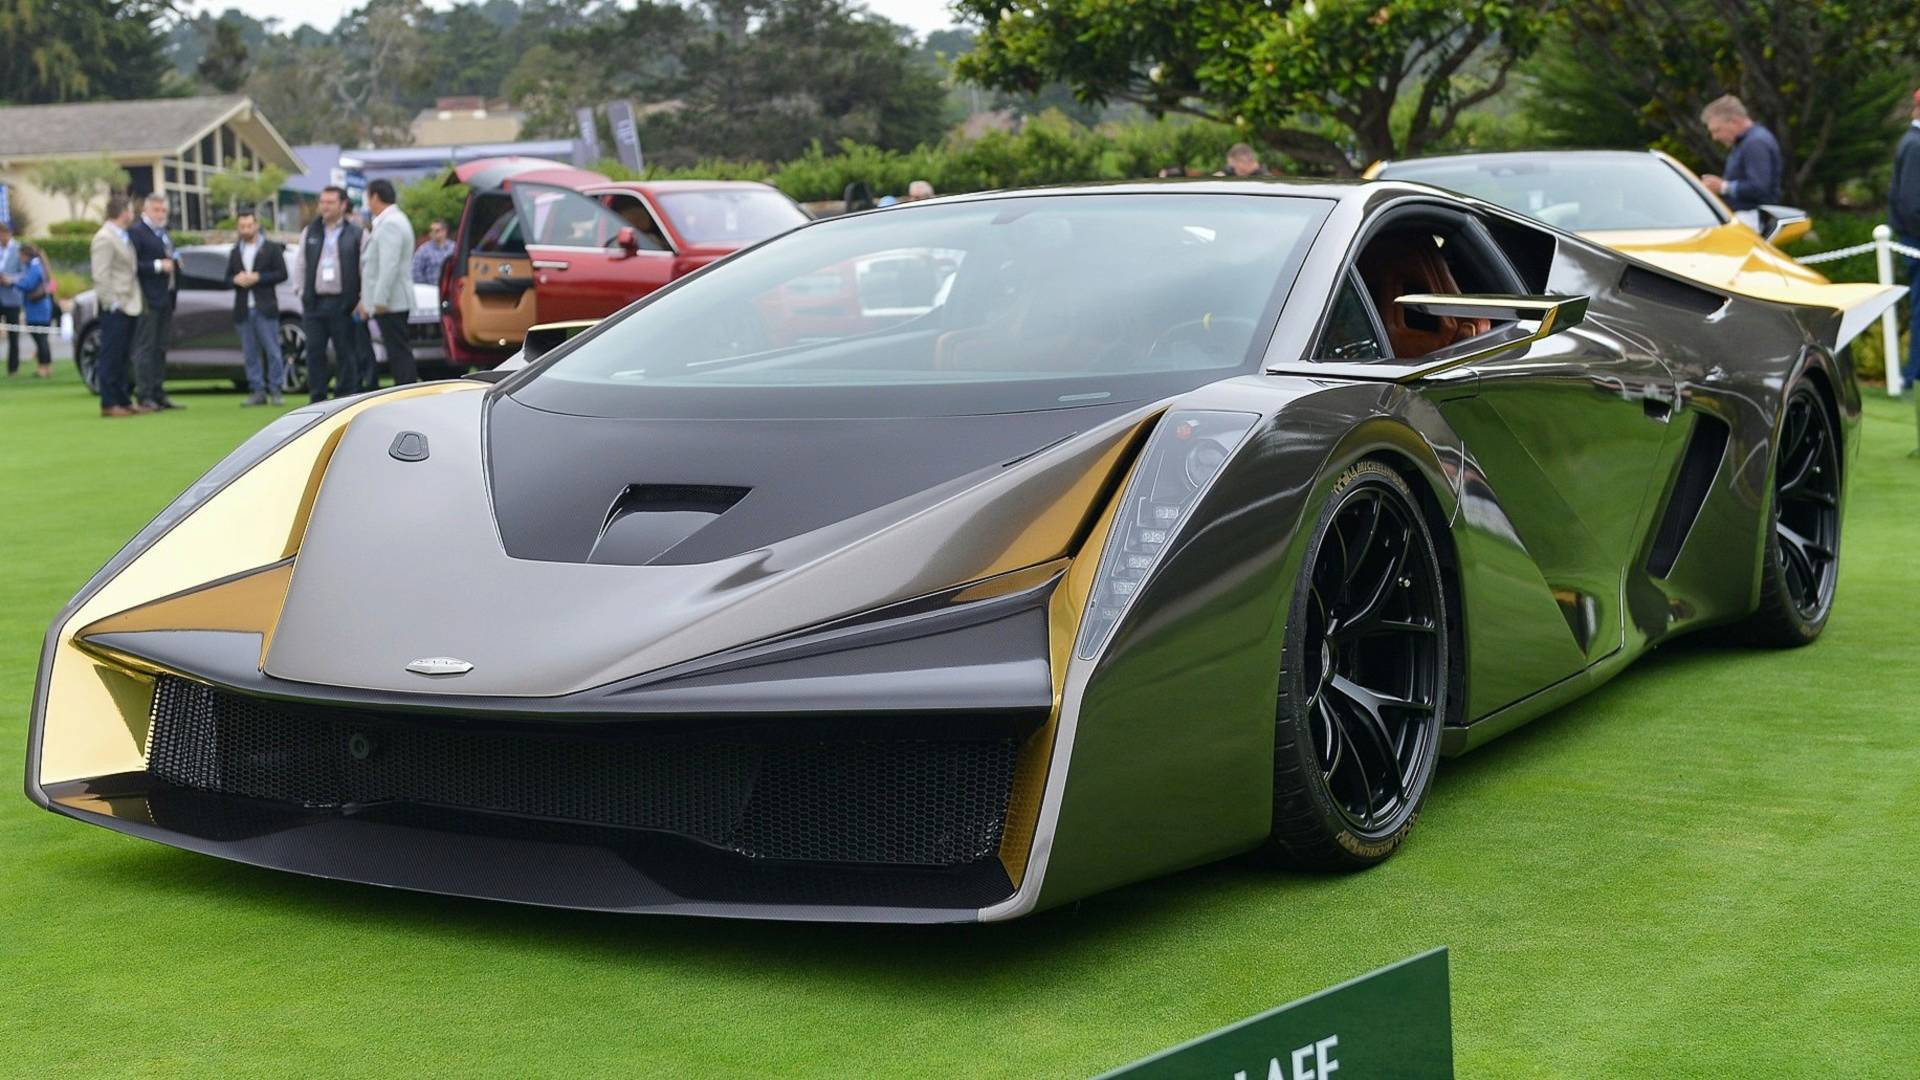 Lamborghini Gallardo Hiding Underneath Edgy Coach-Built Supercar